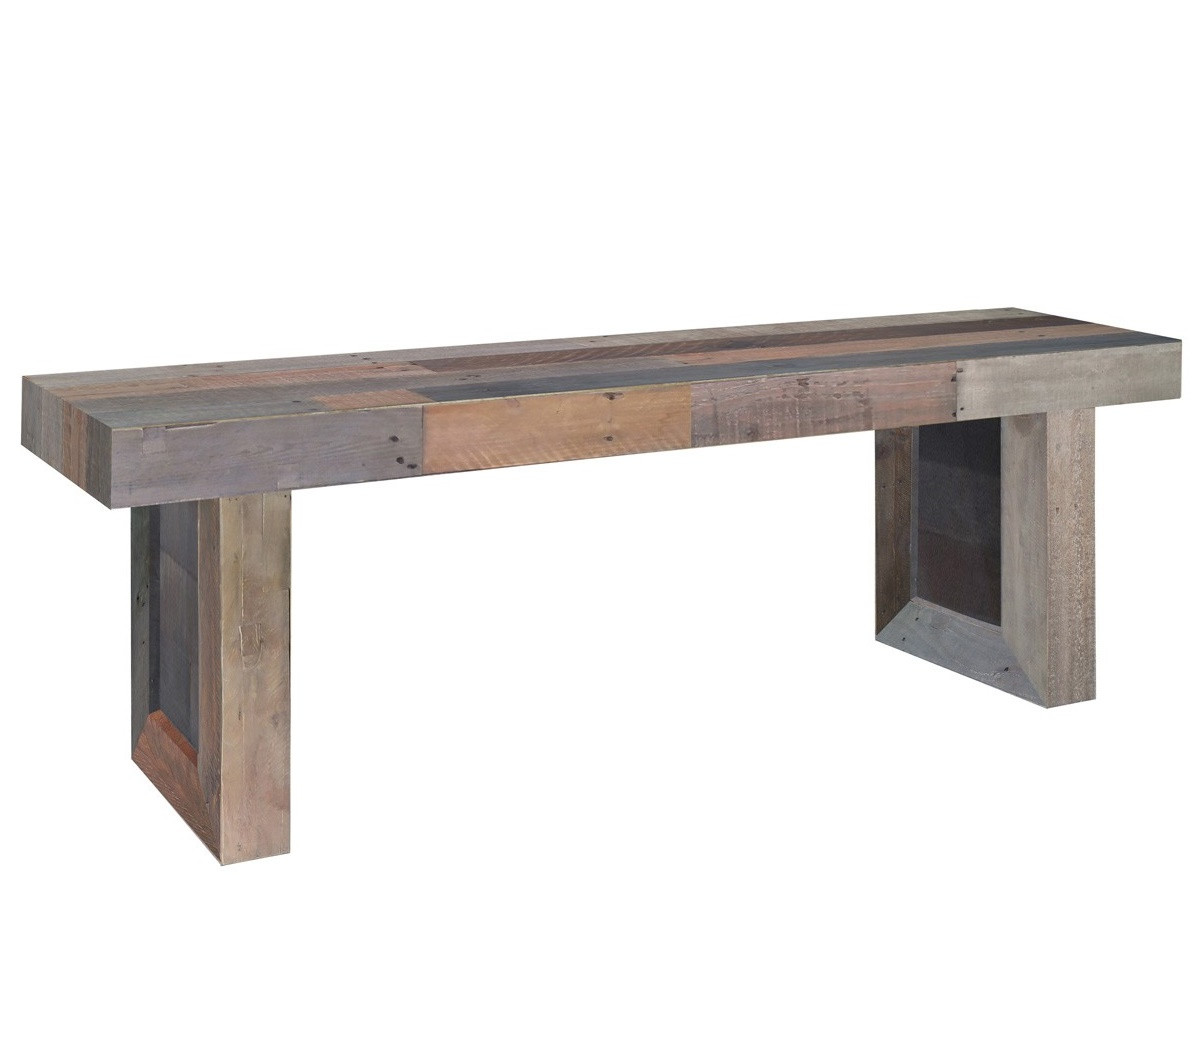 Angora Reclaimed Wood Trestle Dining Bench 71